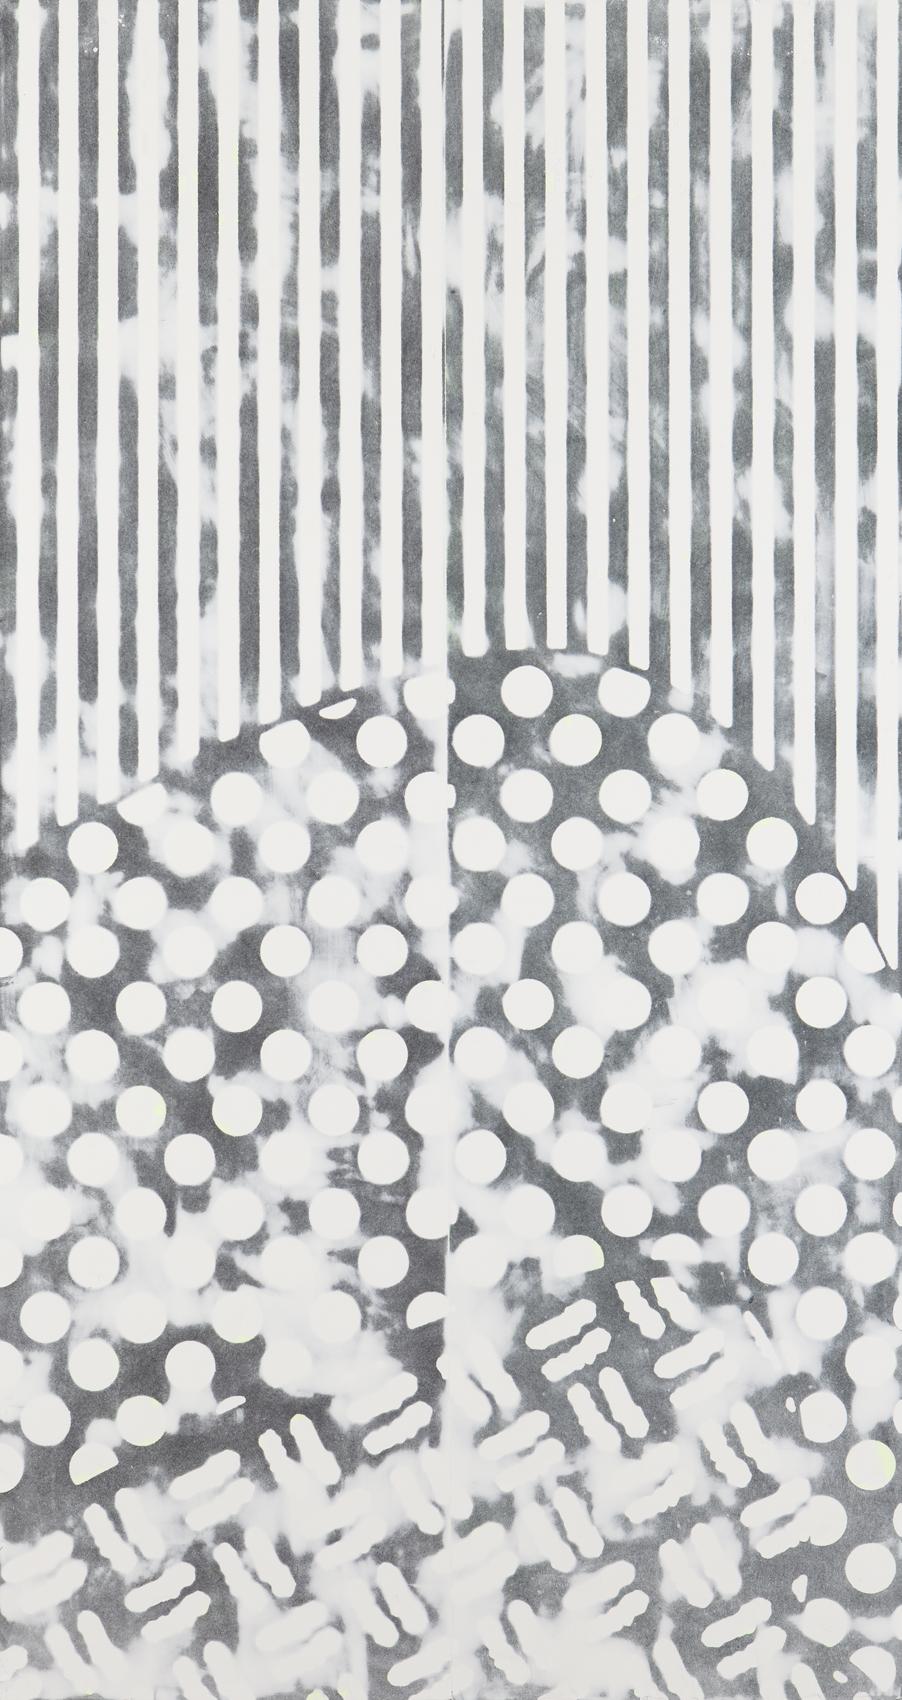 Untitled, 2016, Plaster on MDF, 150x80 cm (6).jpg